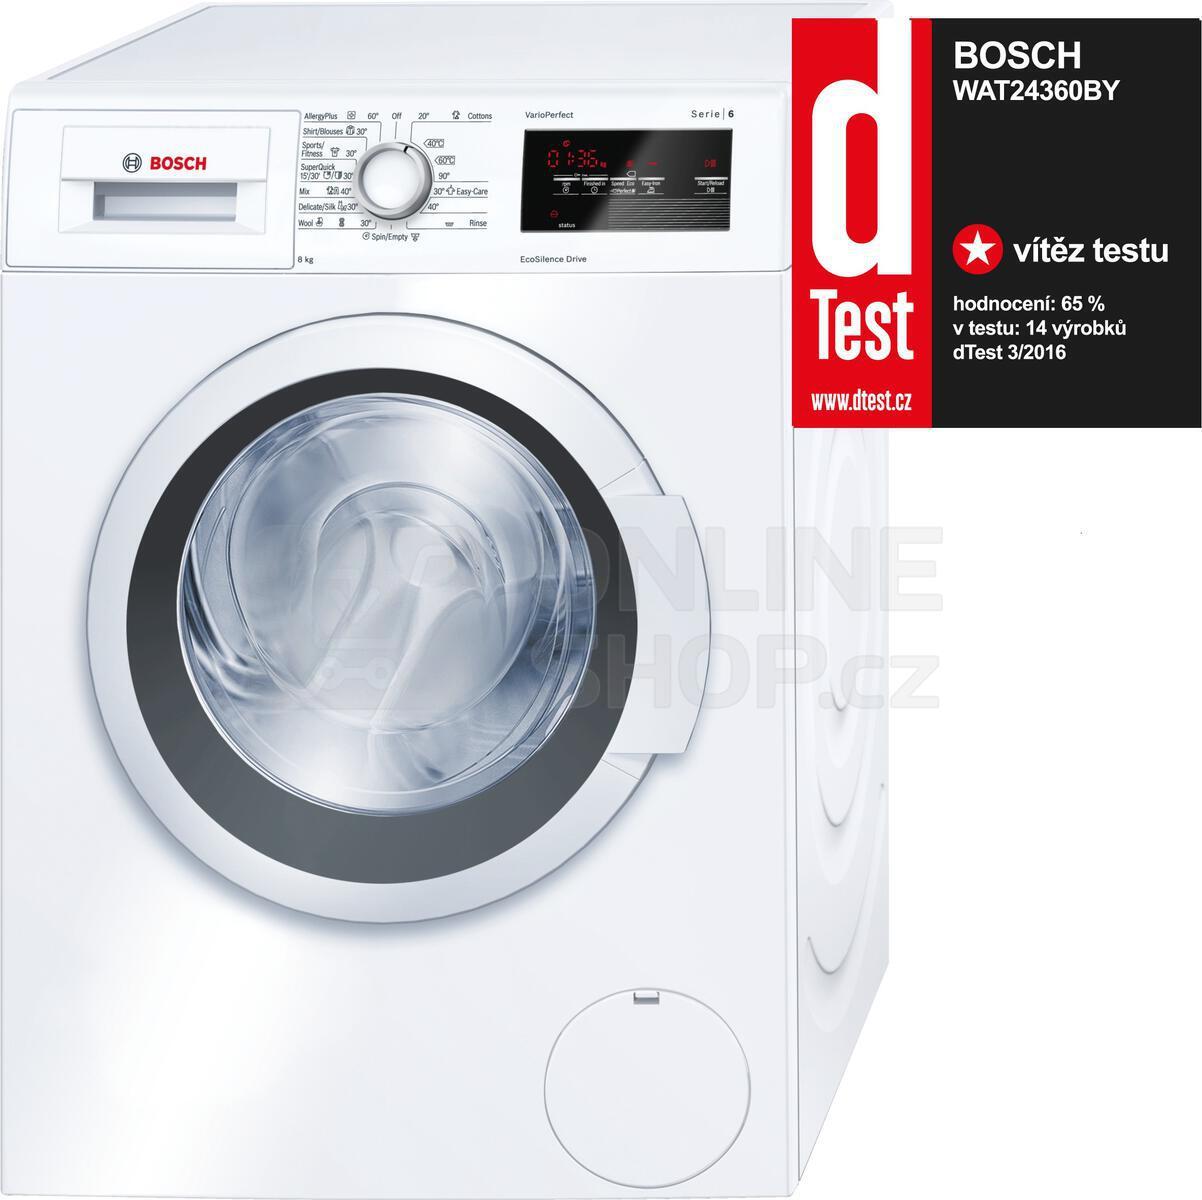 Recenze bosch wat24360by su i ka bosch wtw85460by set for Bosch online shop